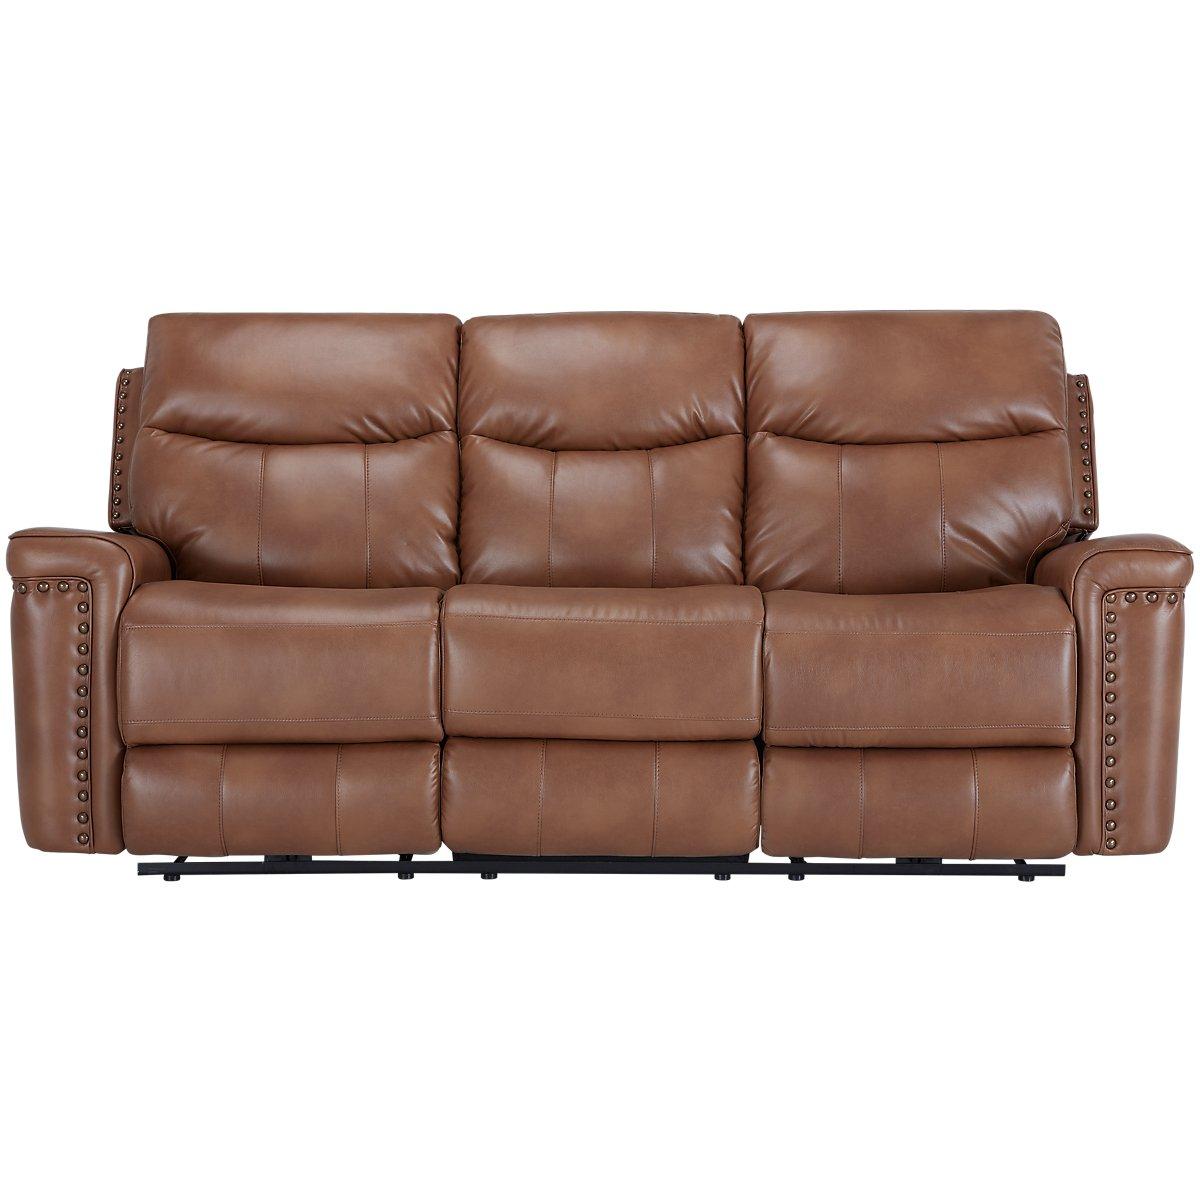 Wallace Medium Brown Microfiber Micro Reclining Sofa